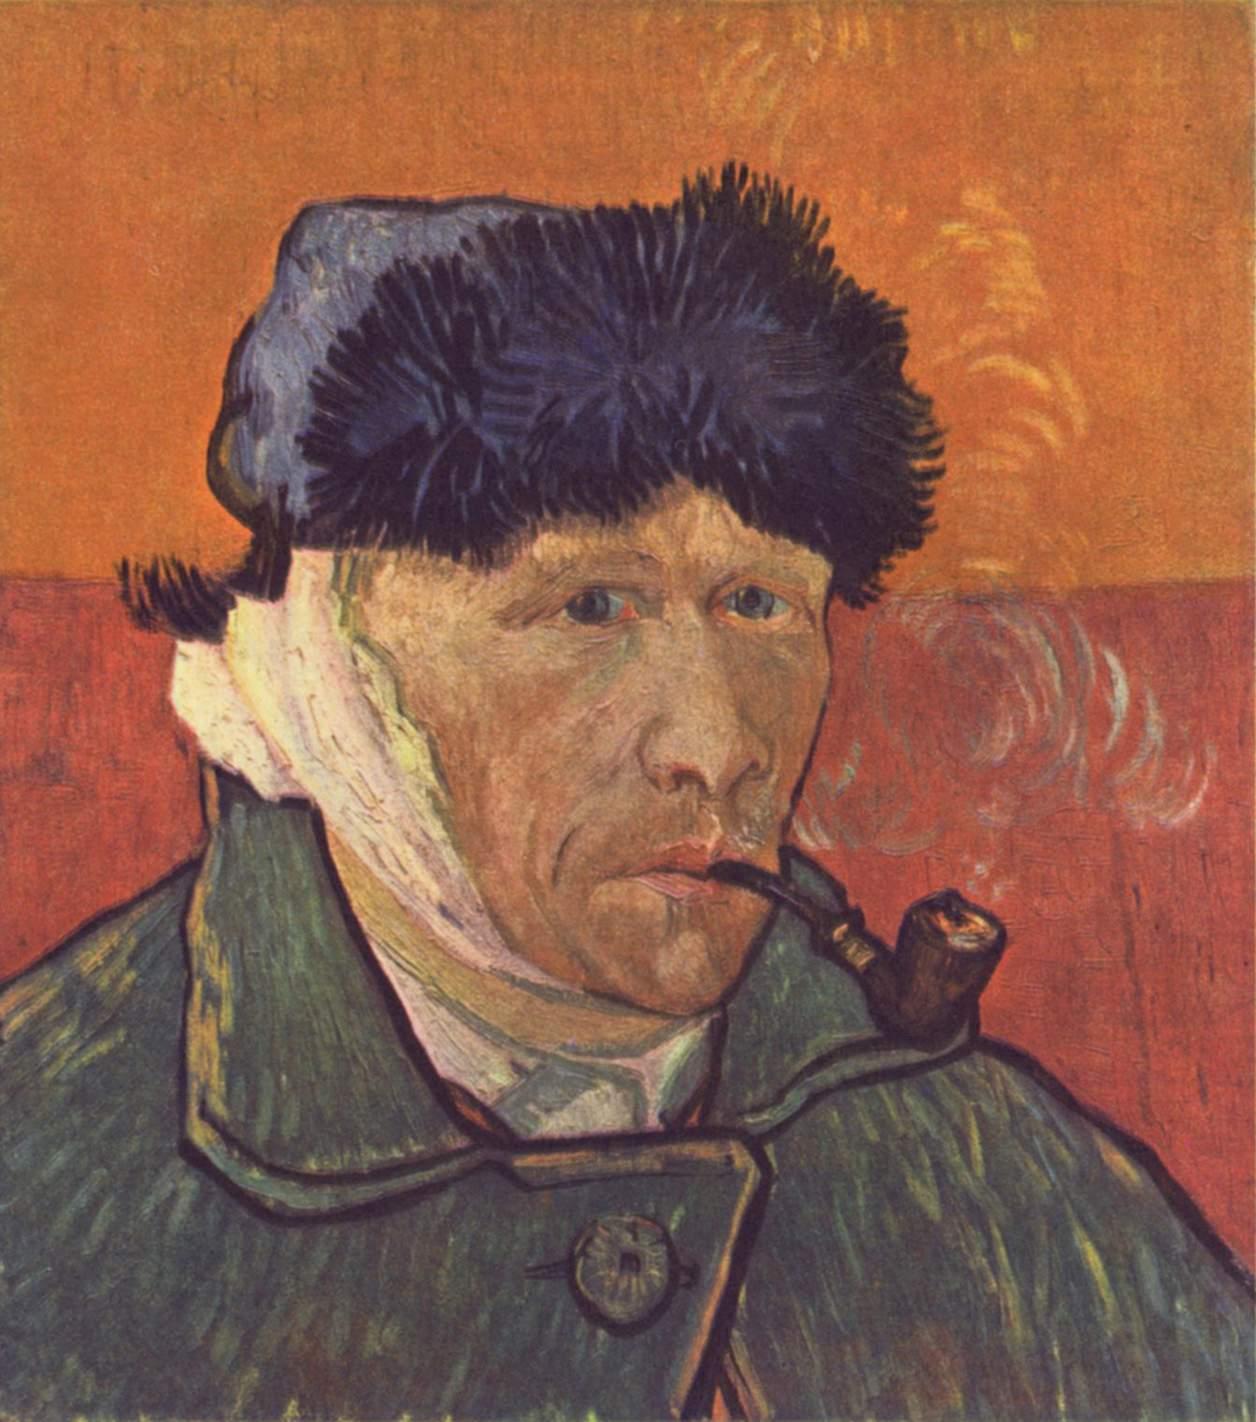 2013-10-23-Vincent_Willem_van_Gogh_106.jpg